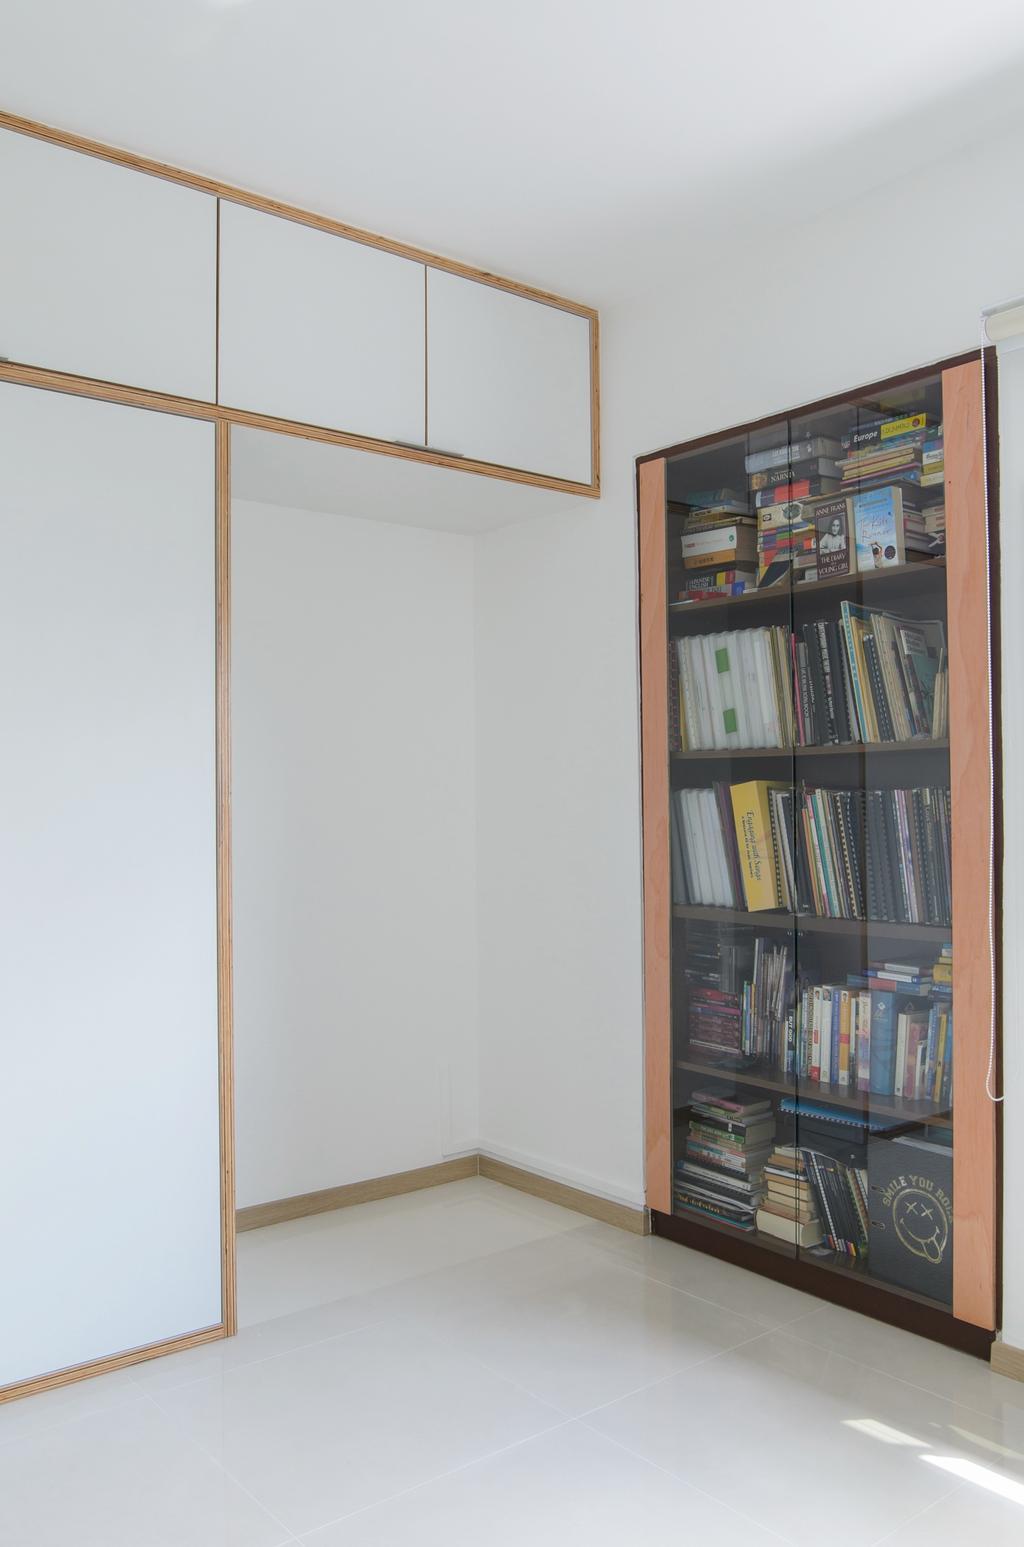 Scandinavian, HDB, Bedroom, Clementi (Block 456), Architect, FOMA Architects, Bookcase, Bookworm, Display Case, Furniture, Shelf